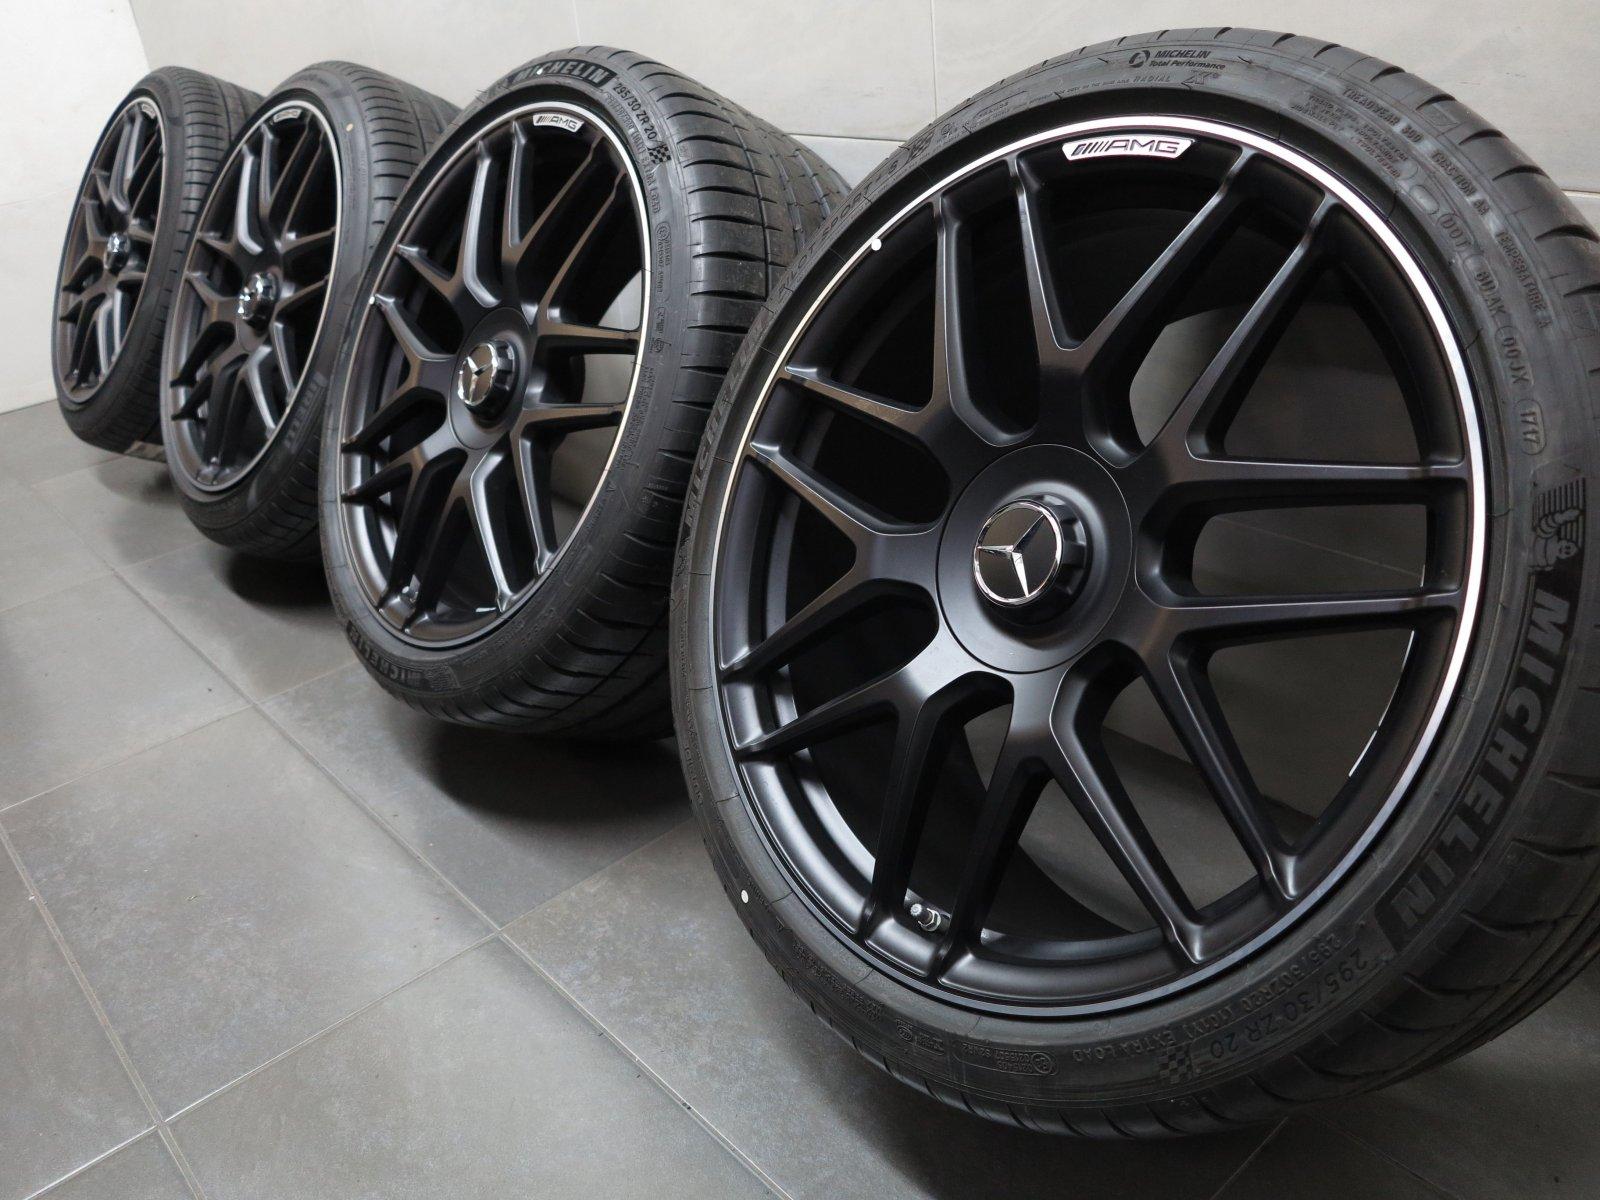 20 inch original summer wheels mercedes e class rims e63 e63s amg w213 b200 ebay. Black Bedroom Furniture Sets. Home Design Ideas